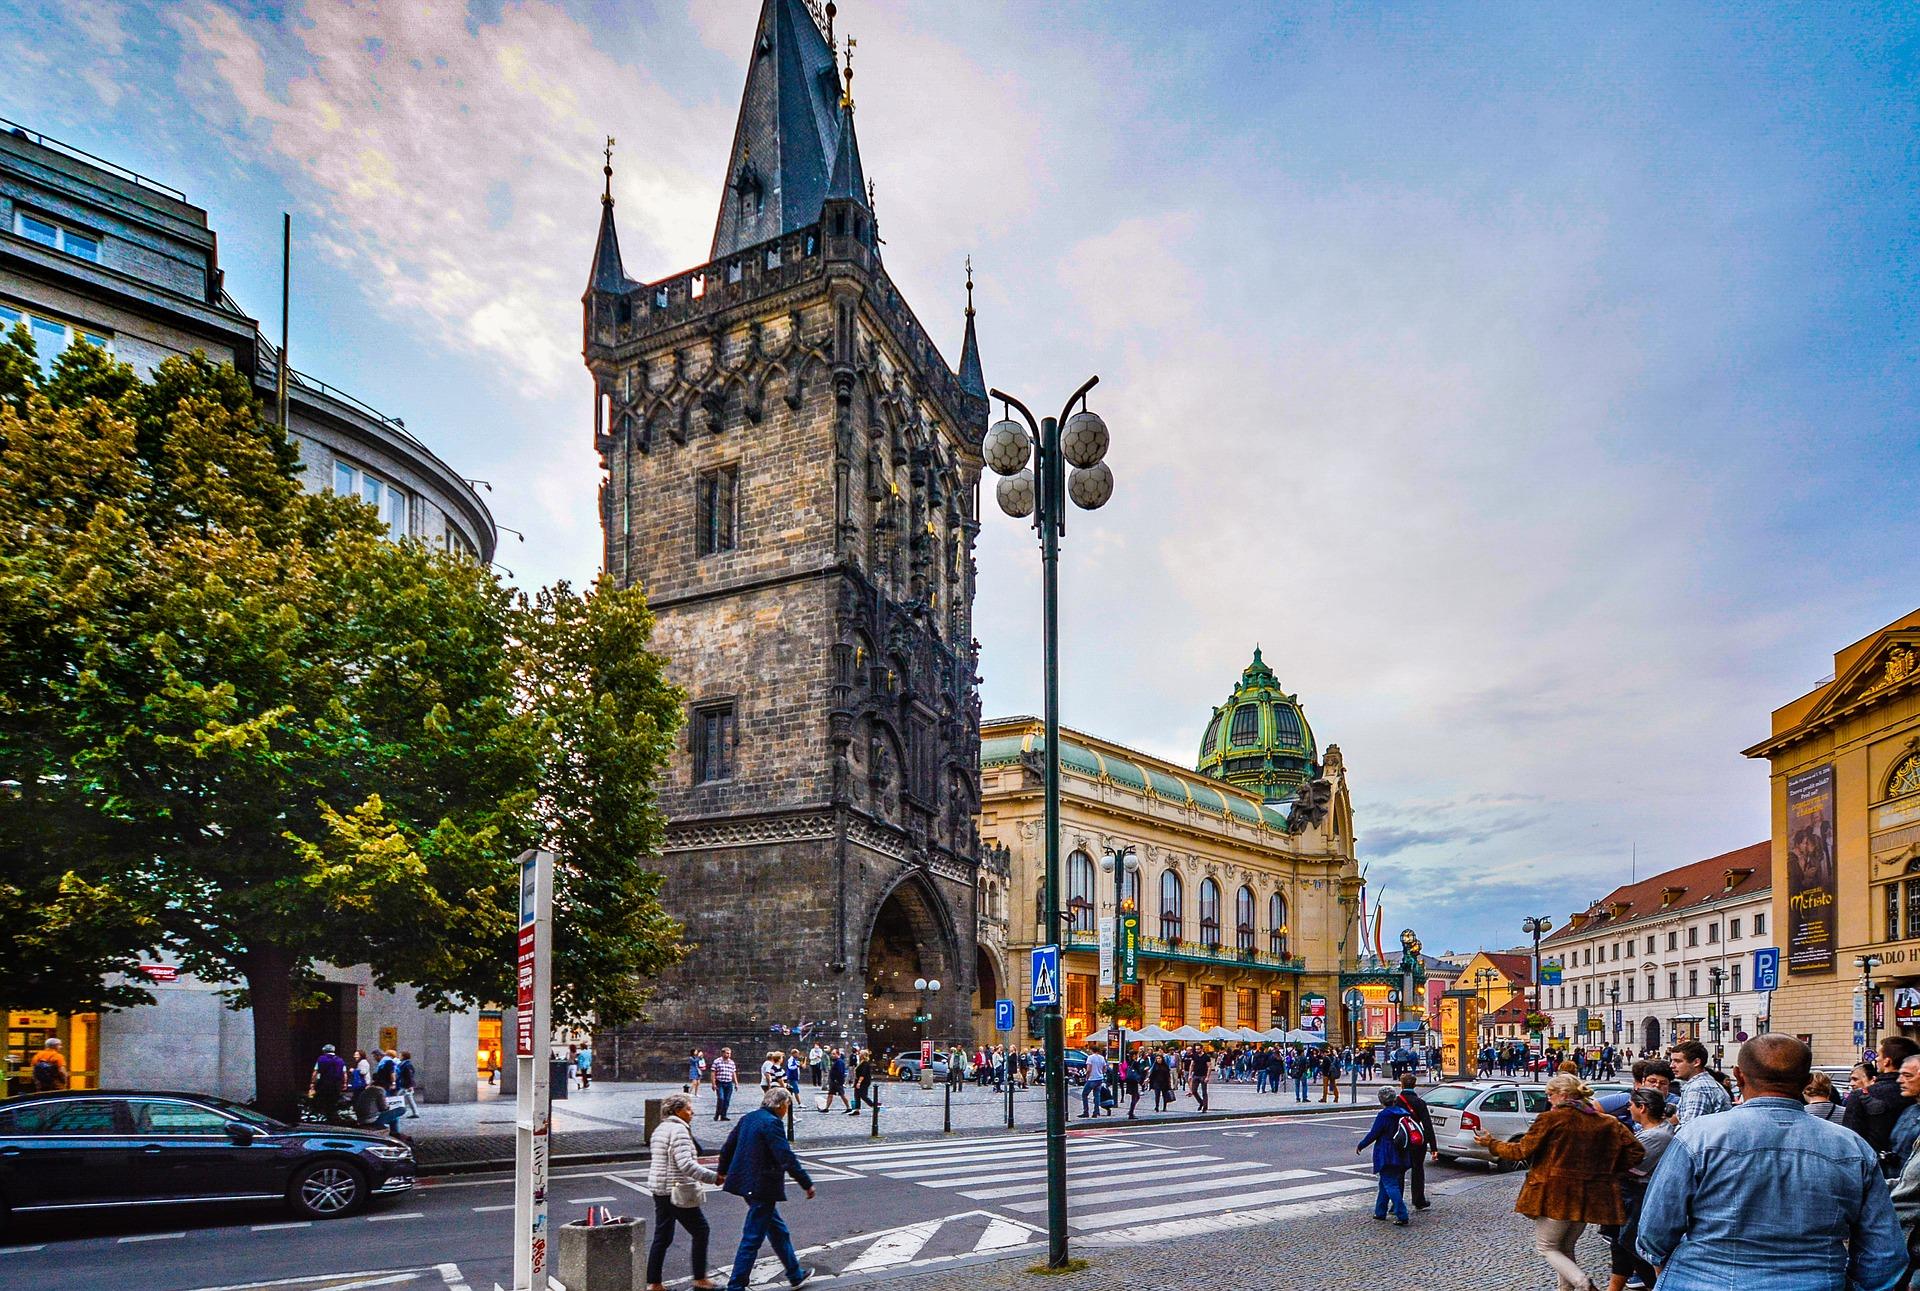 Guard Tower on Charles Bridge in Prague, Czech Republic